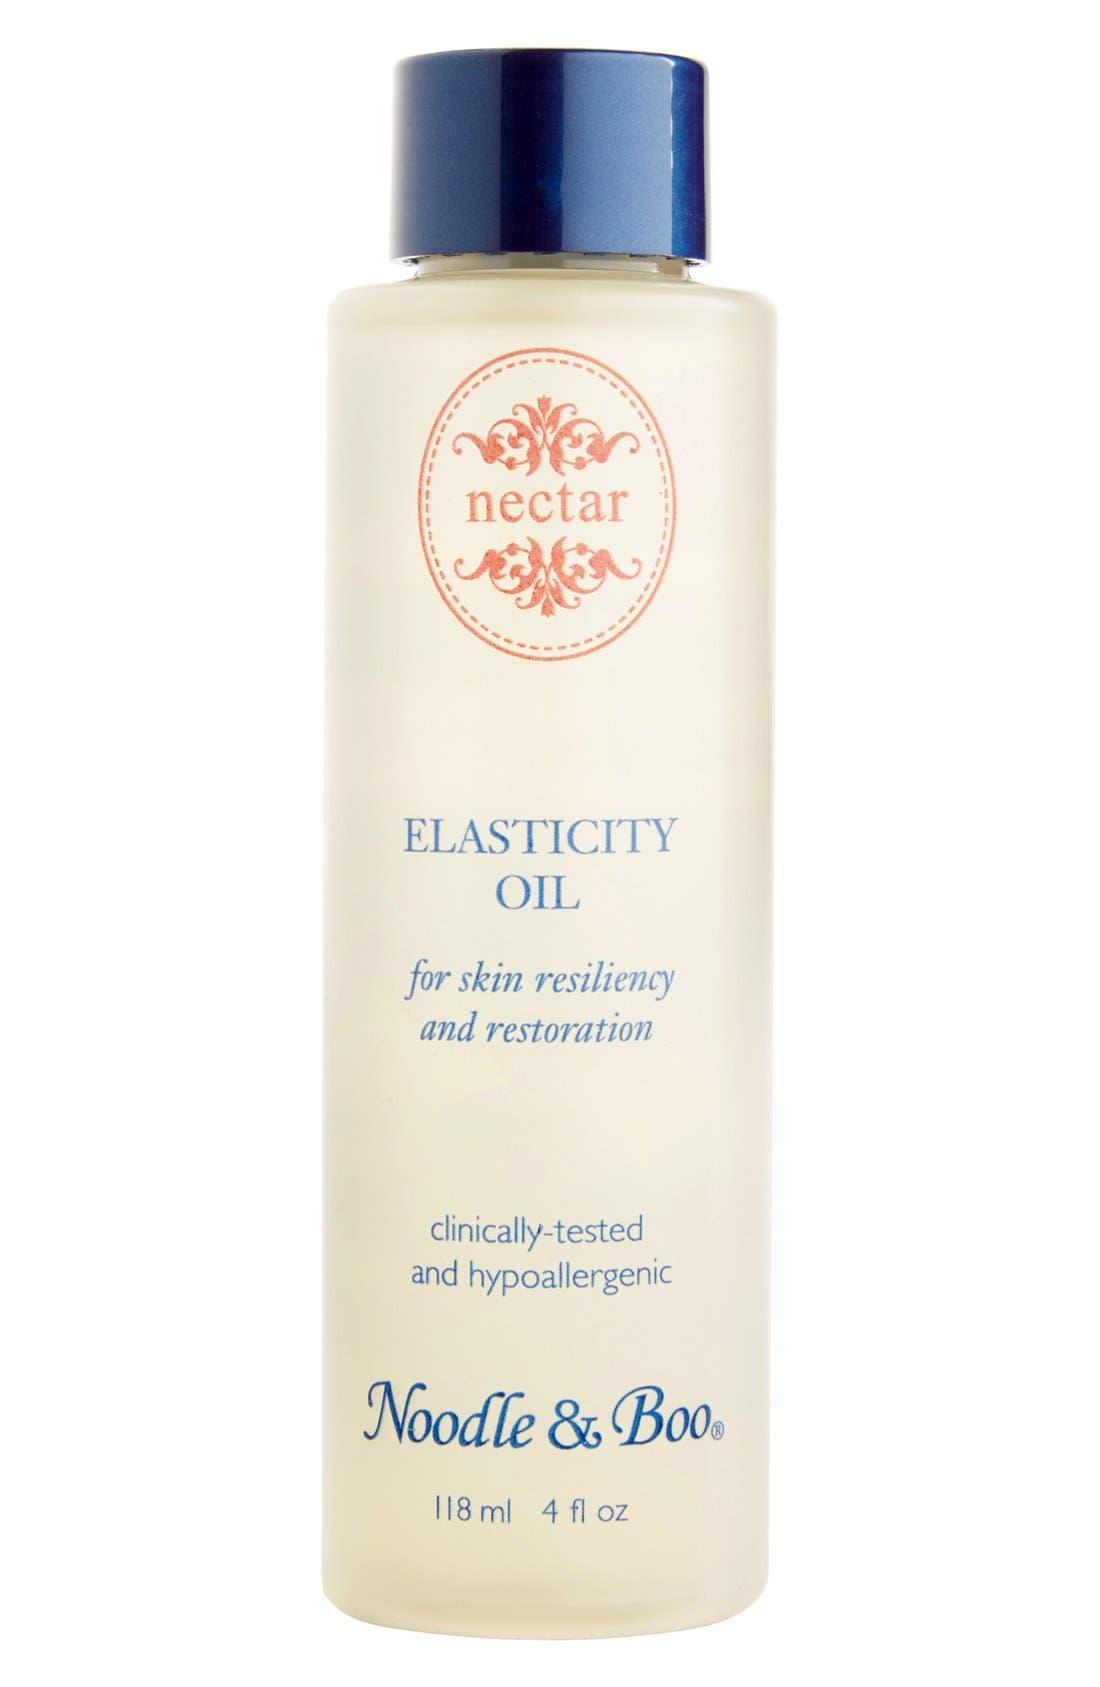 Noodle & Boo 'nectar' Elasticity Oil